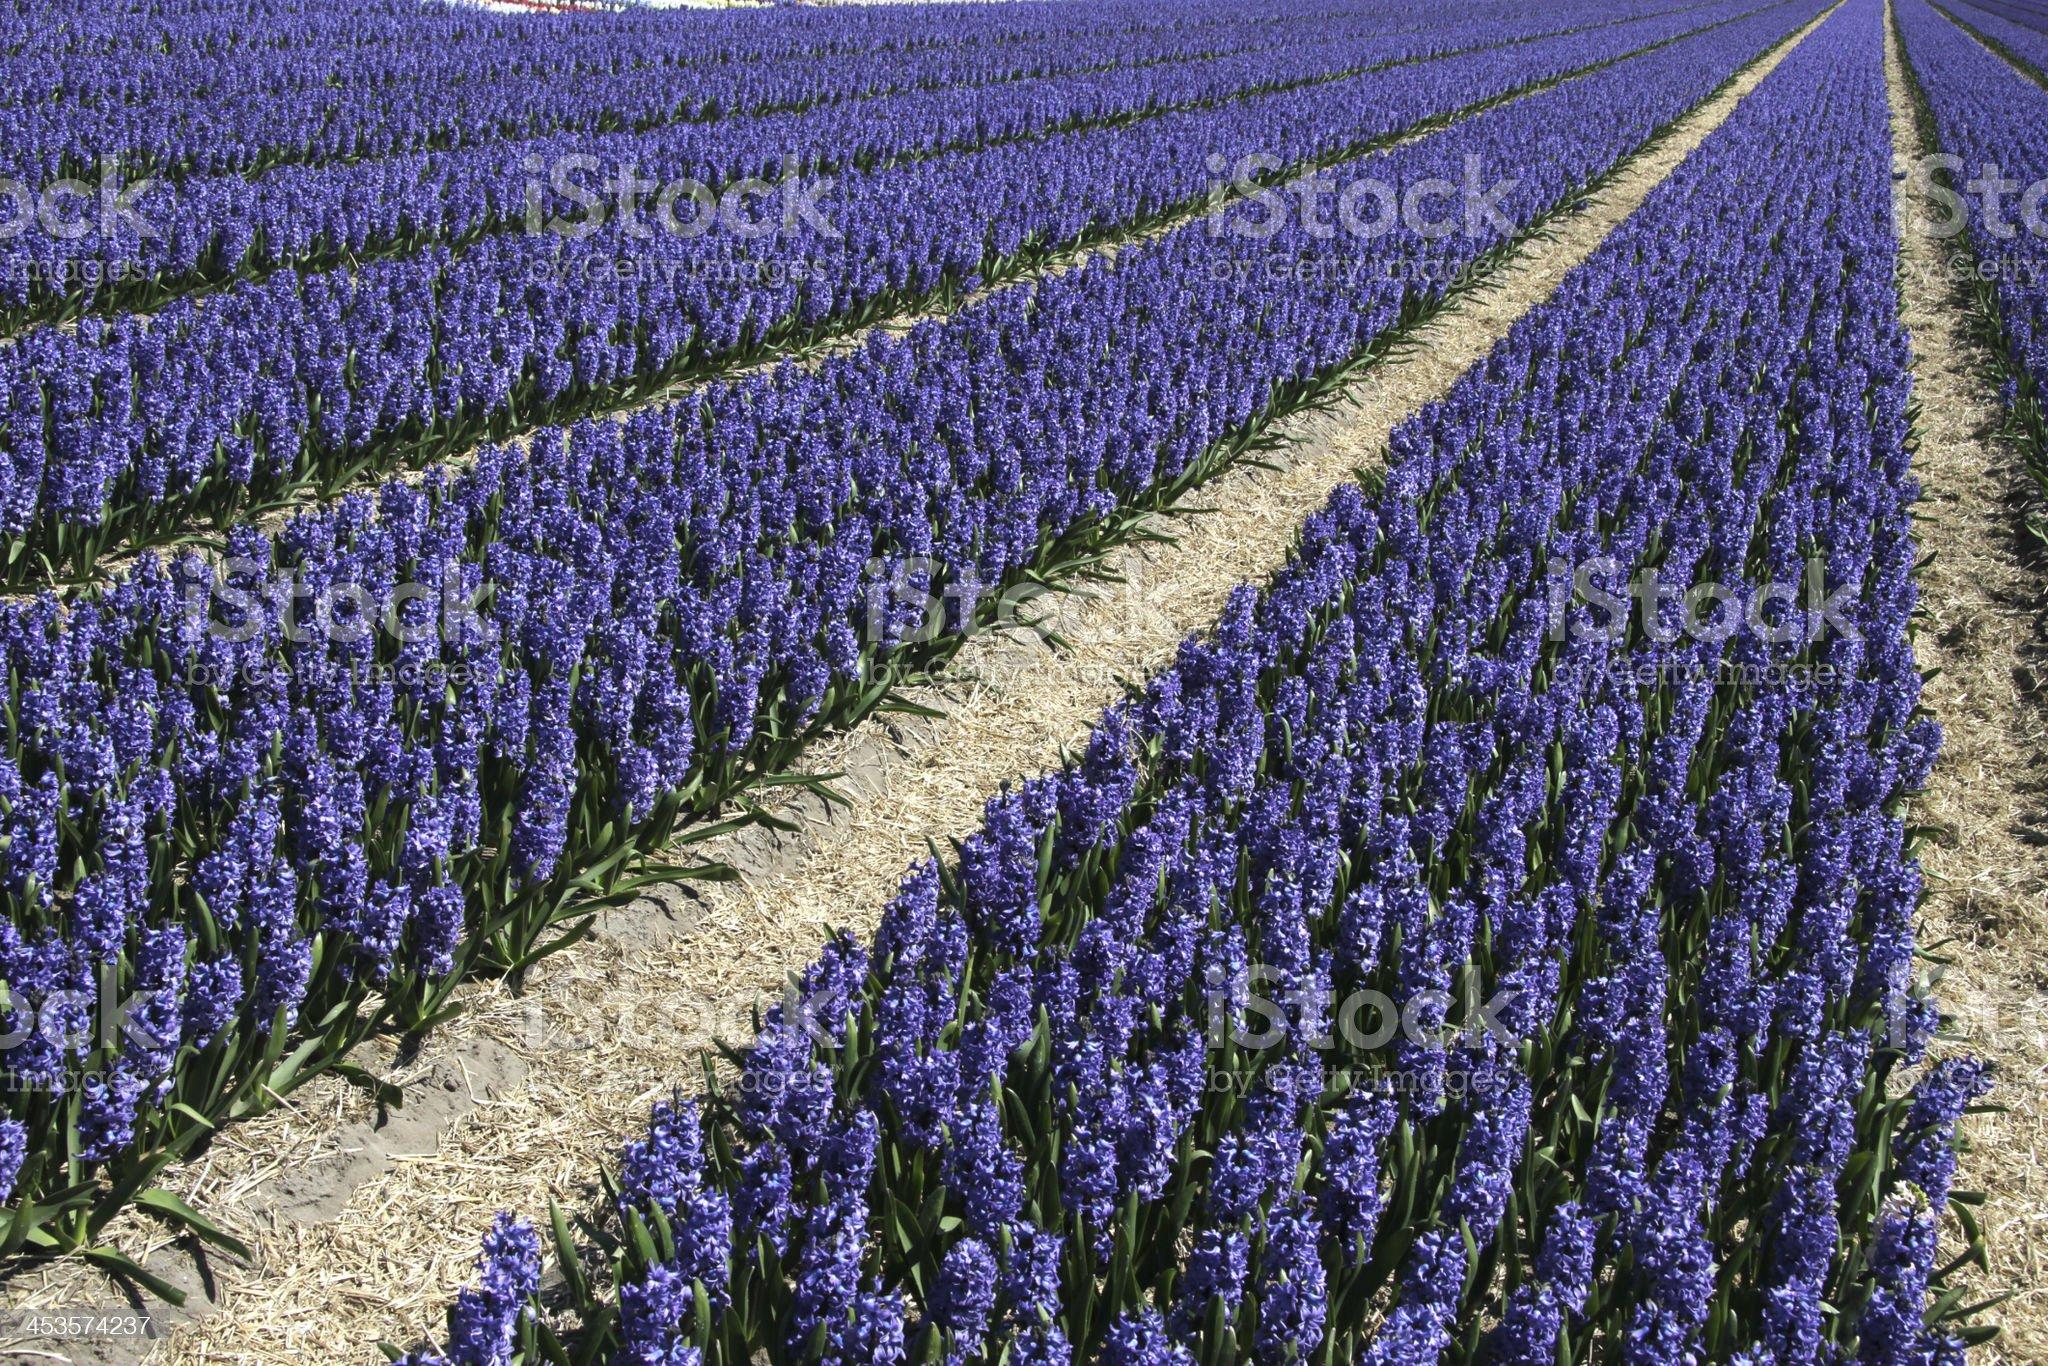 Flower field at Keukenhof gardens in The Netherlands royalty-free stock photo